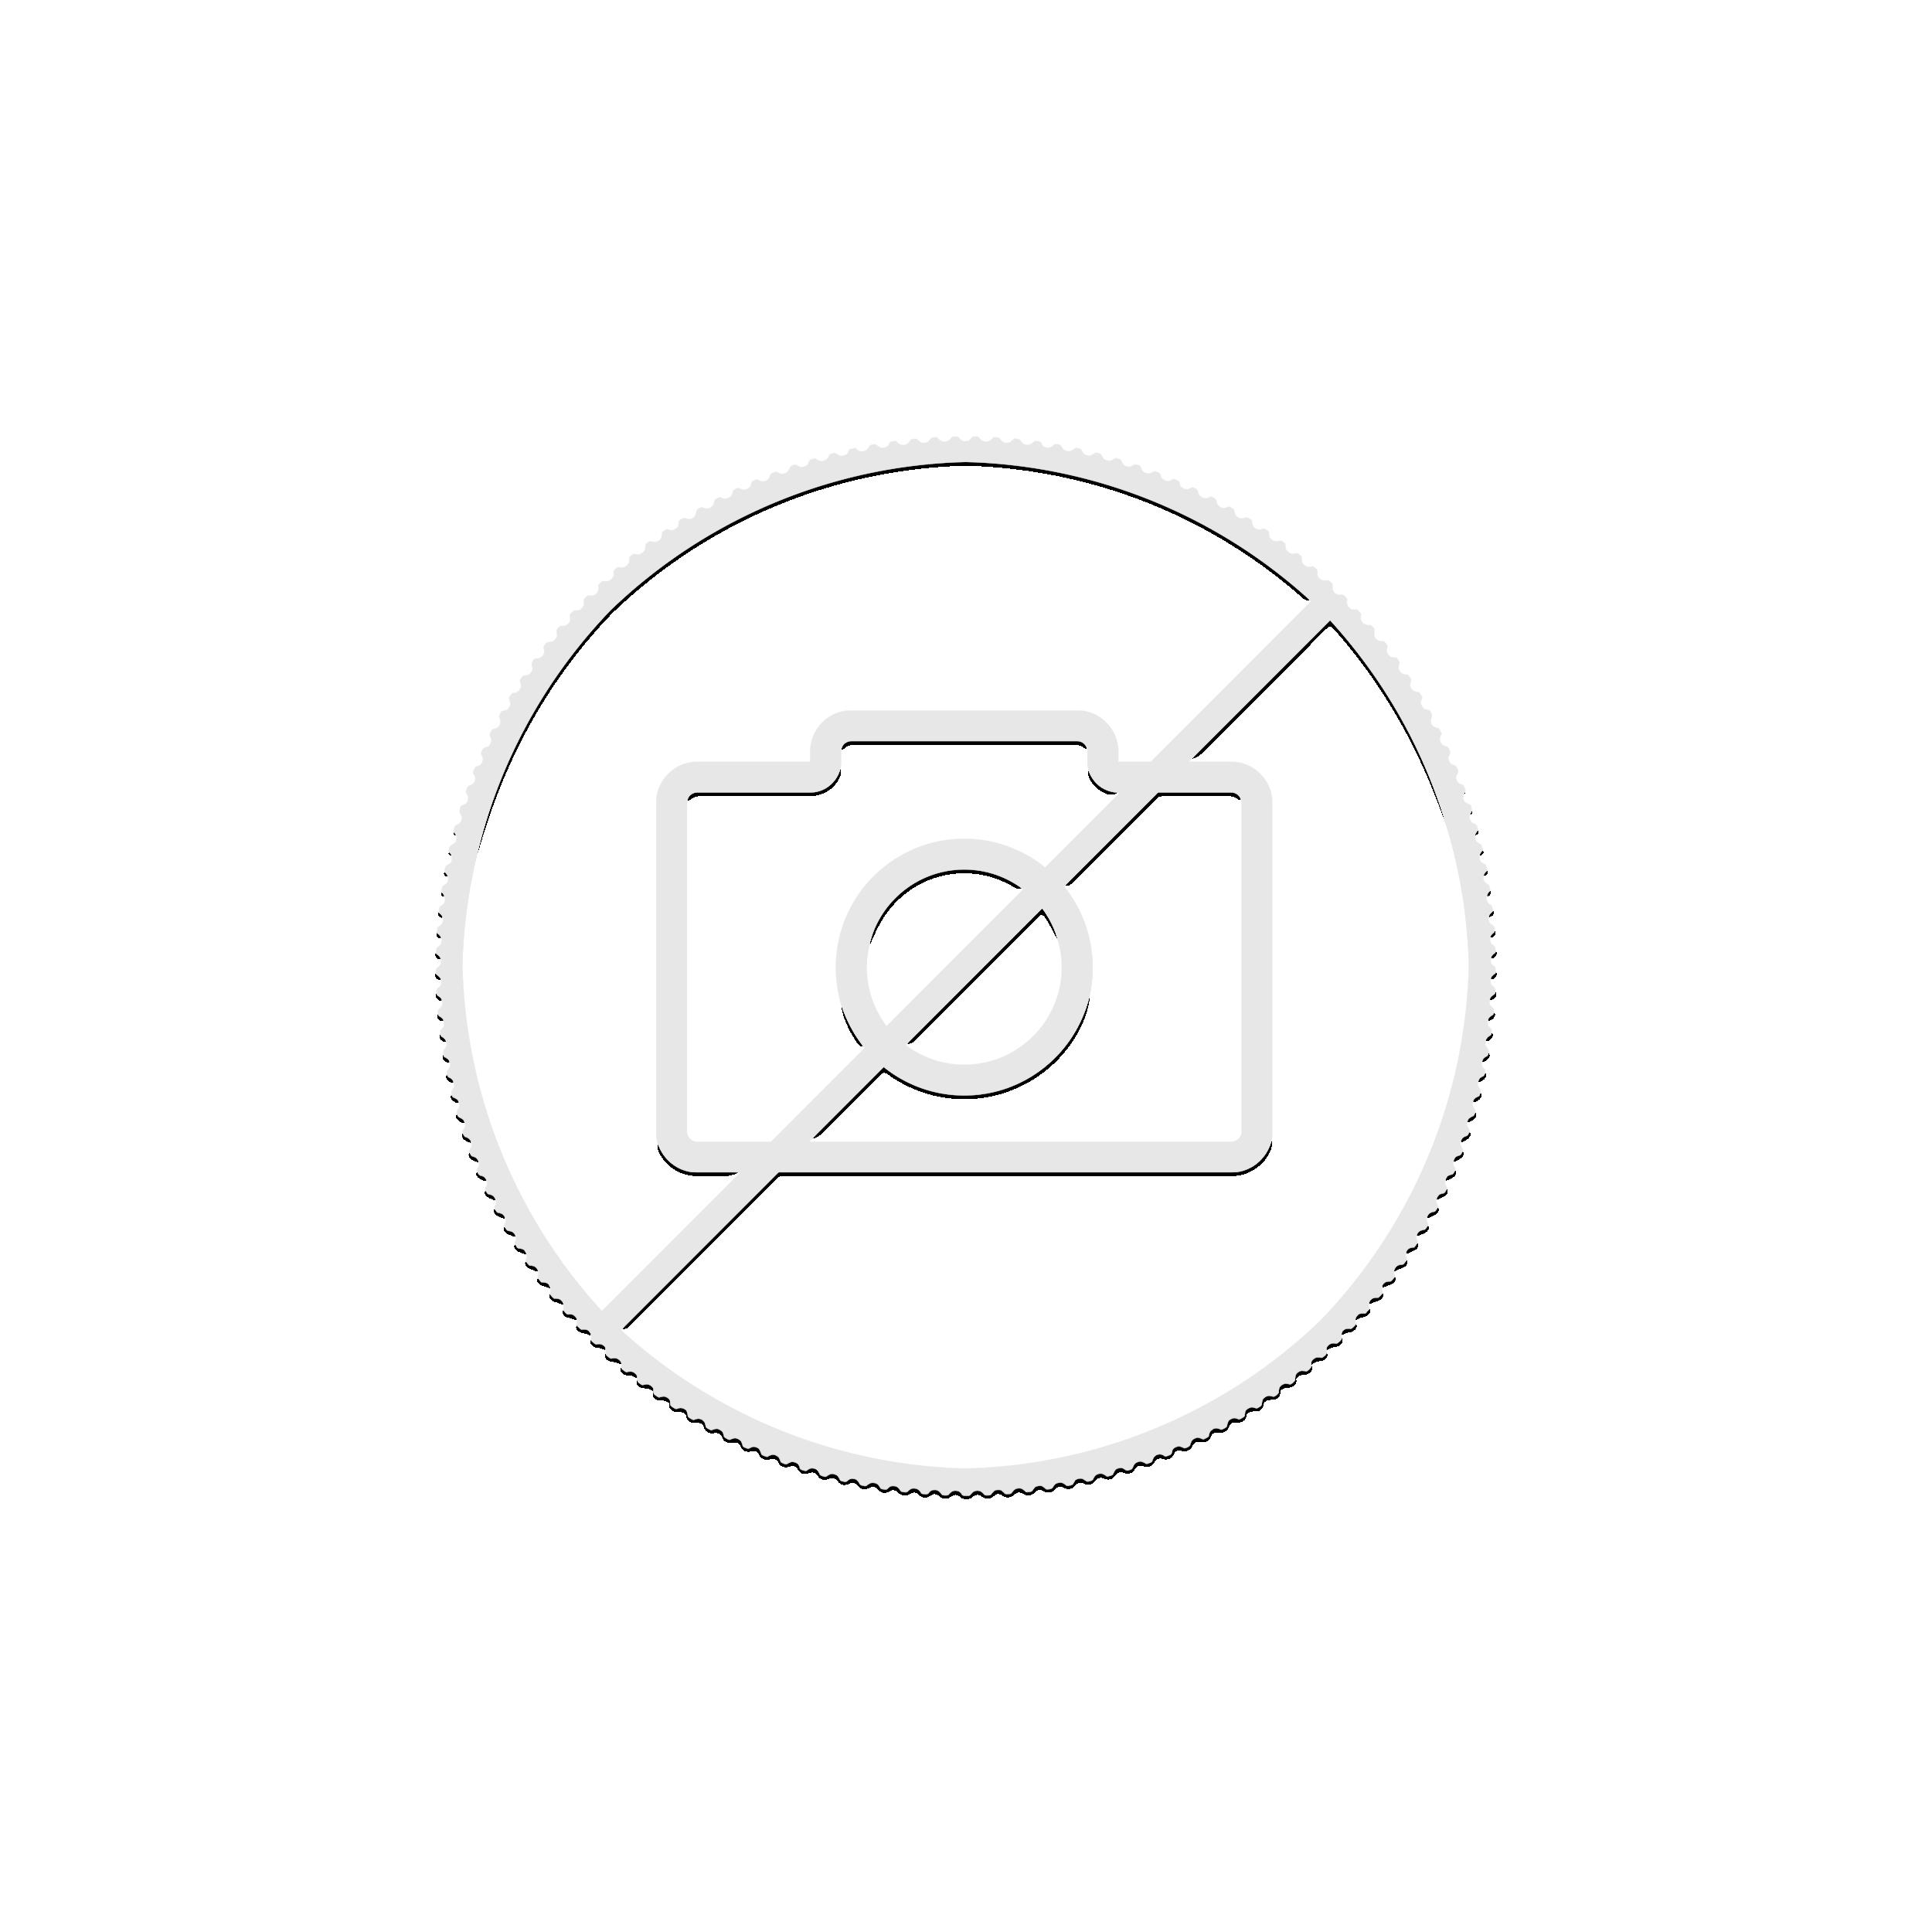 Britannia zilveren munt 10 troy ounce 2021